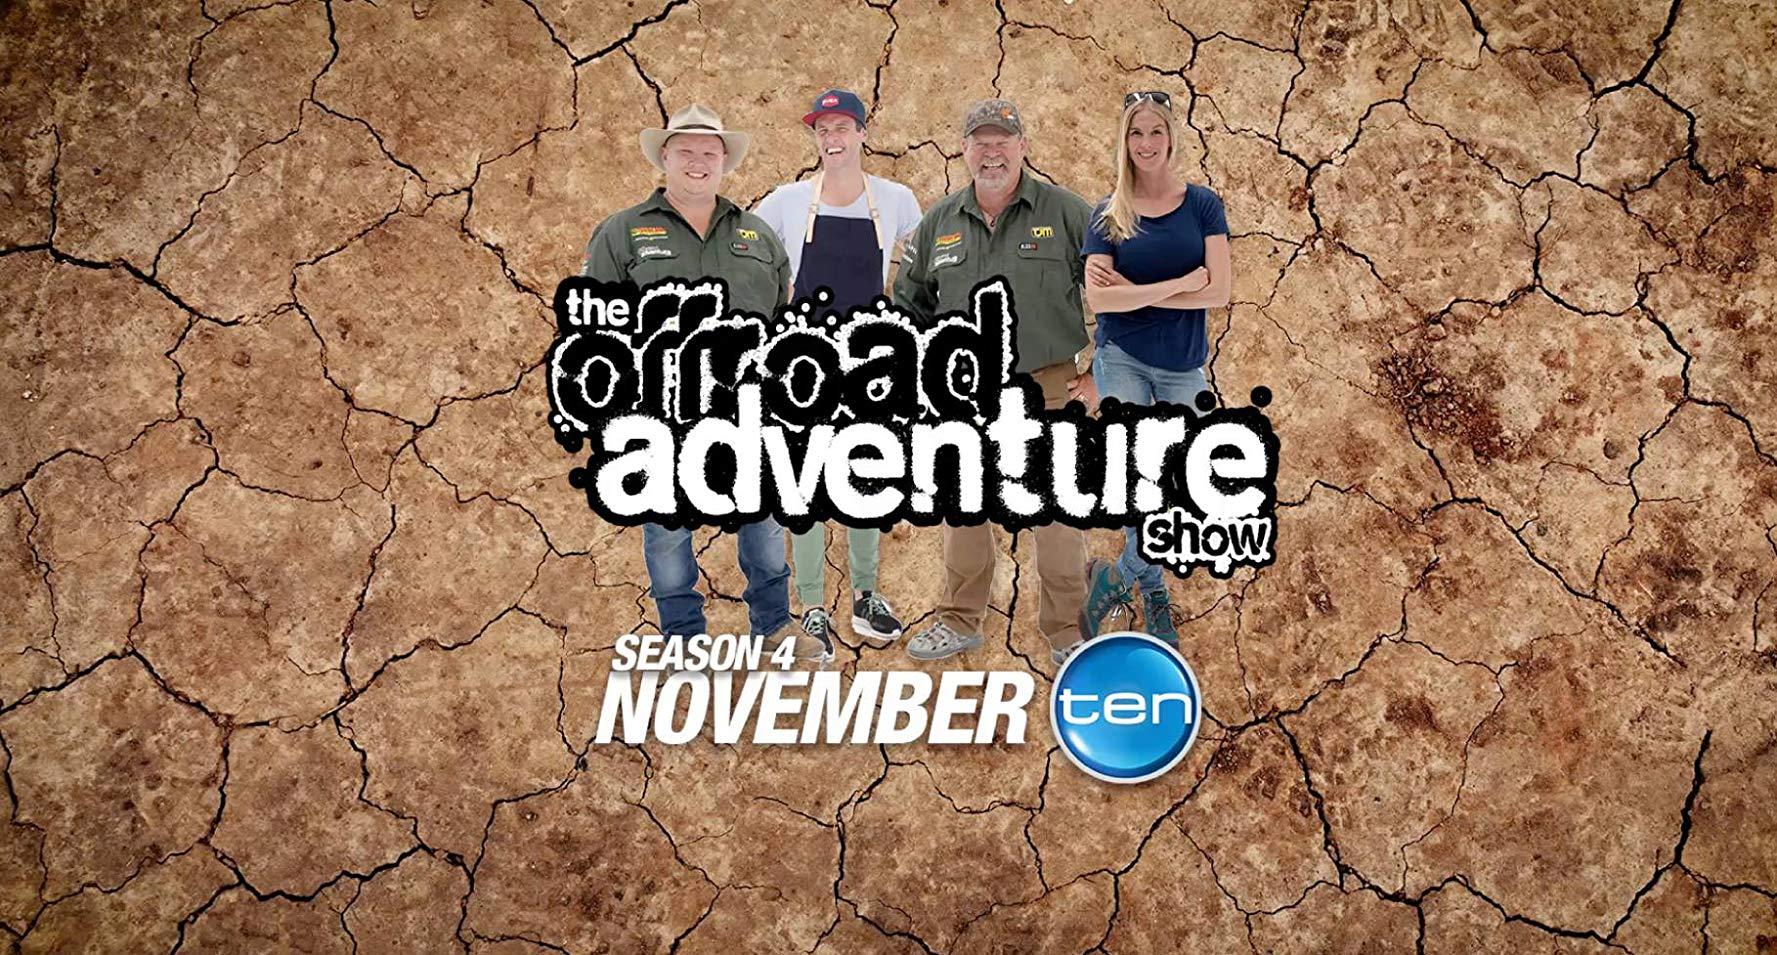 The Offroad Adventure Show S05E01 WEB H264-SHADOWS